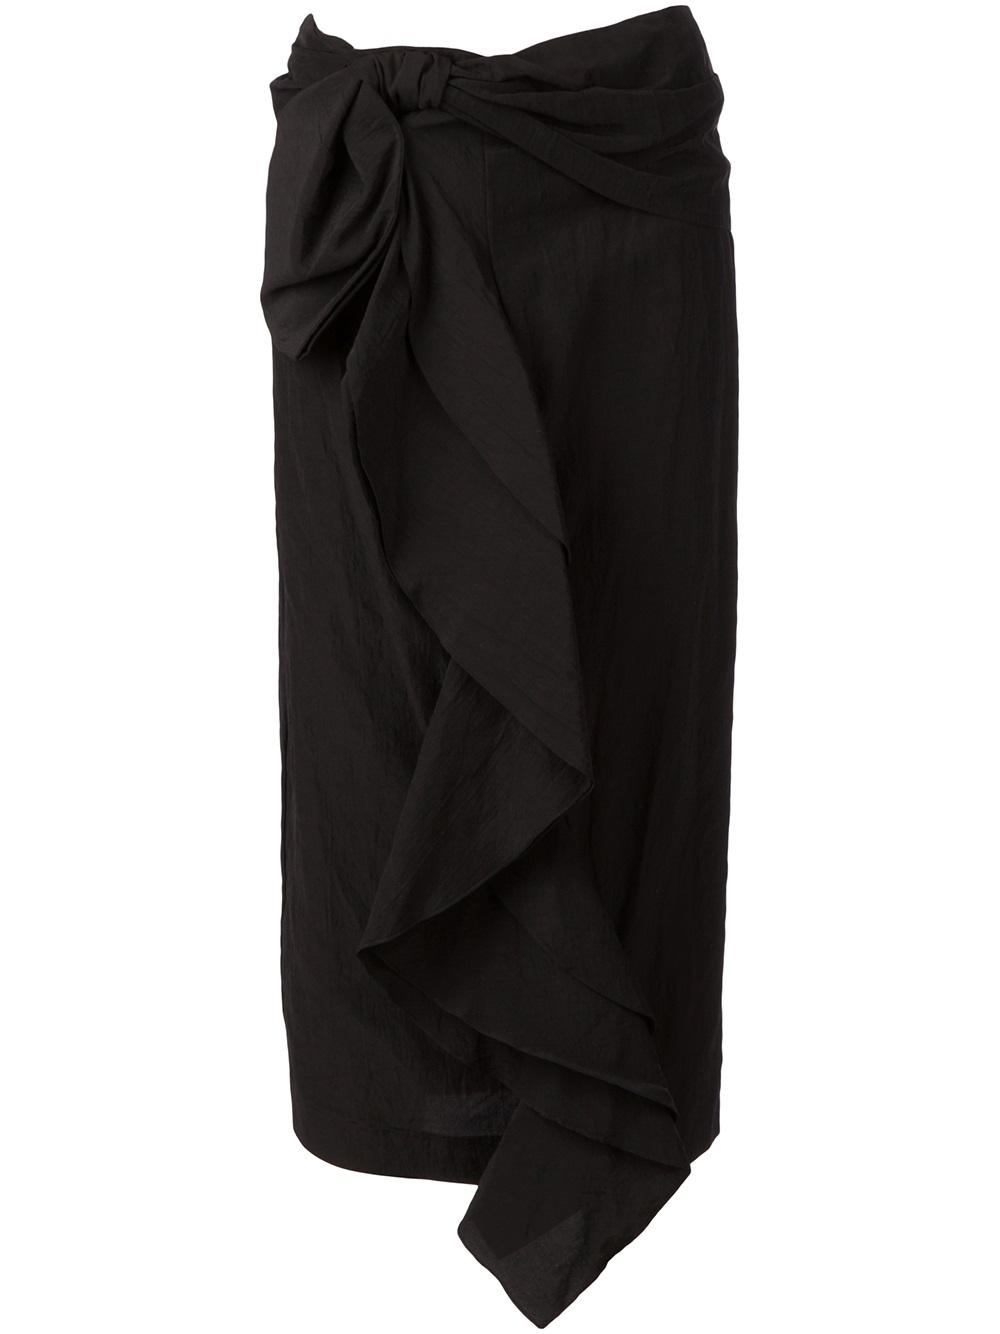 f4e0a9e34d Marni Draped Ruffle Midi Skirt in Black - Lyst